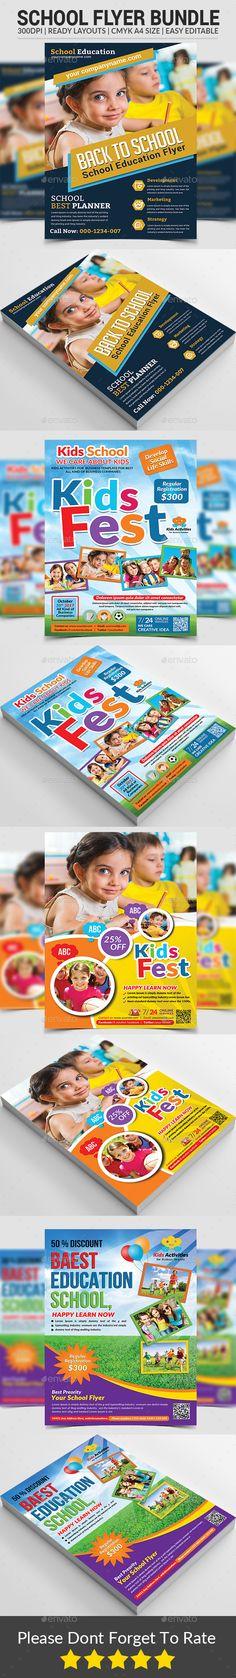 School Flyer Templates PSD Bundle